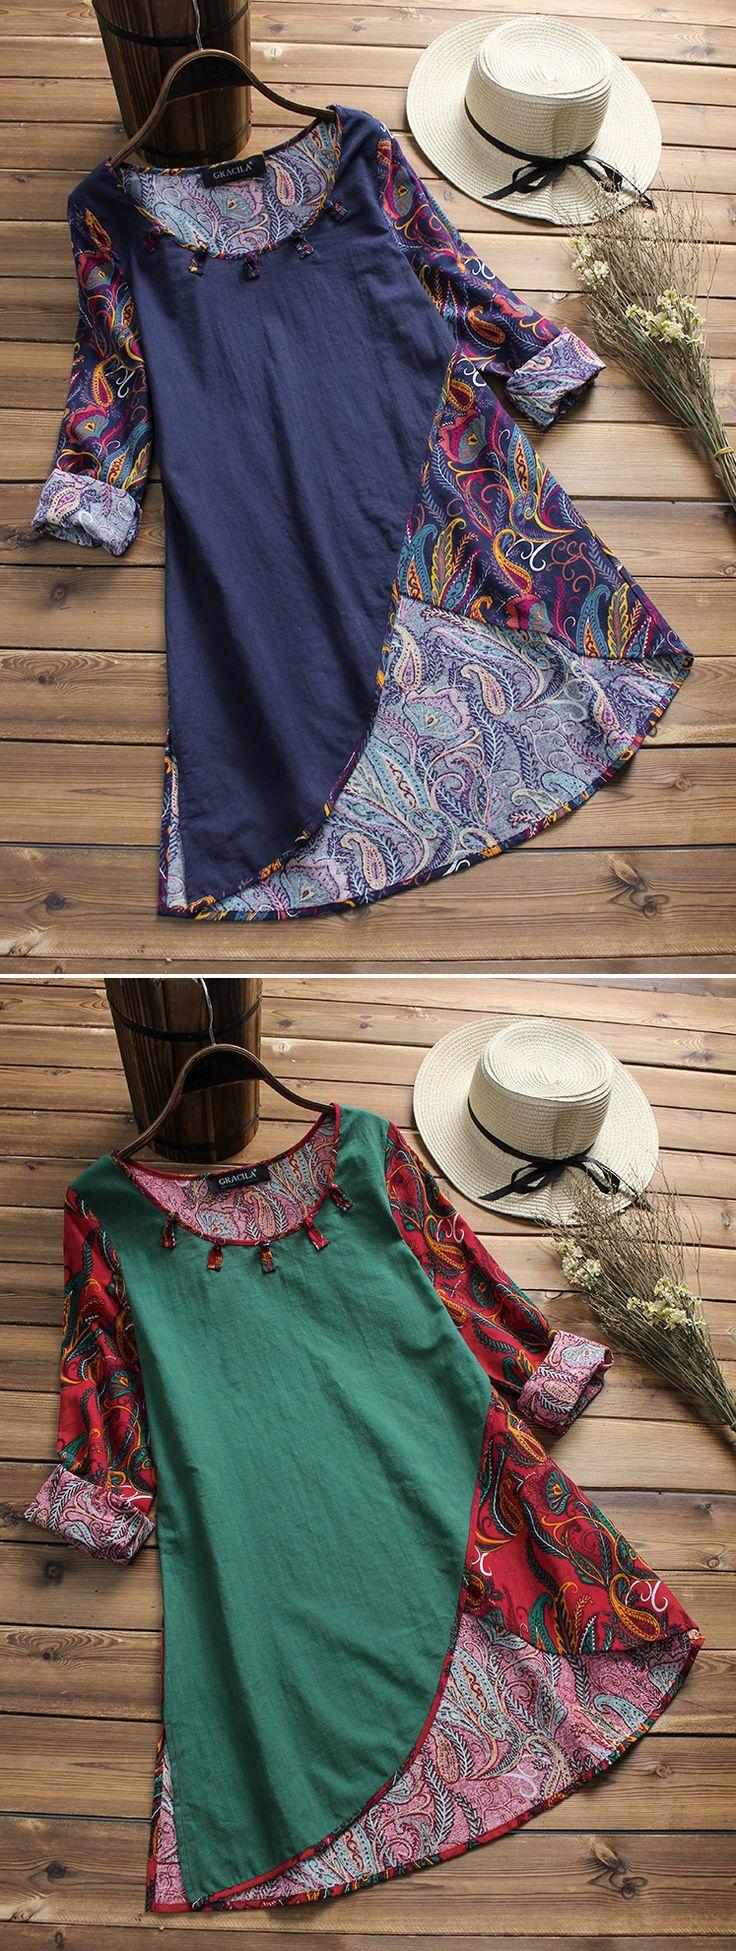 UP TO 51% OFF! Women Printed Patchwork Irregular Hem Vintage T-shirts. SHOP NOW! -… - https://sorihe.com/blusademujer/2018/03/29/up-to-51-off-women-printed-patchwork-irregular-hem-vintage-t-shirts-shop-now-2/ #women'sblouse #blouse #ladiestops #womensshirts #topsforwomen #shirtsforwomen #ladiesblouse #blackblouse #women'sshirts #womenshirt #whiteblouse #blackshirtwomens #longtopsforwomen #long tops #women'sshirtsandblouses #cutetopsforwomen #shirtsandblouses #dressytops #tunictopsfor women…